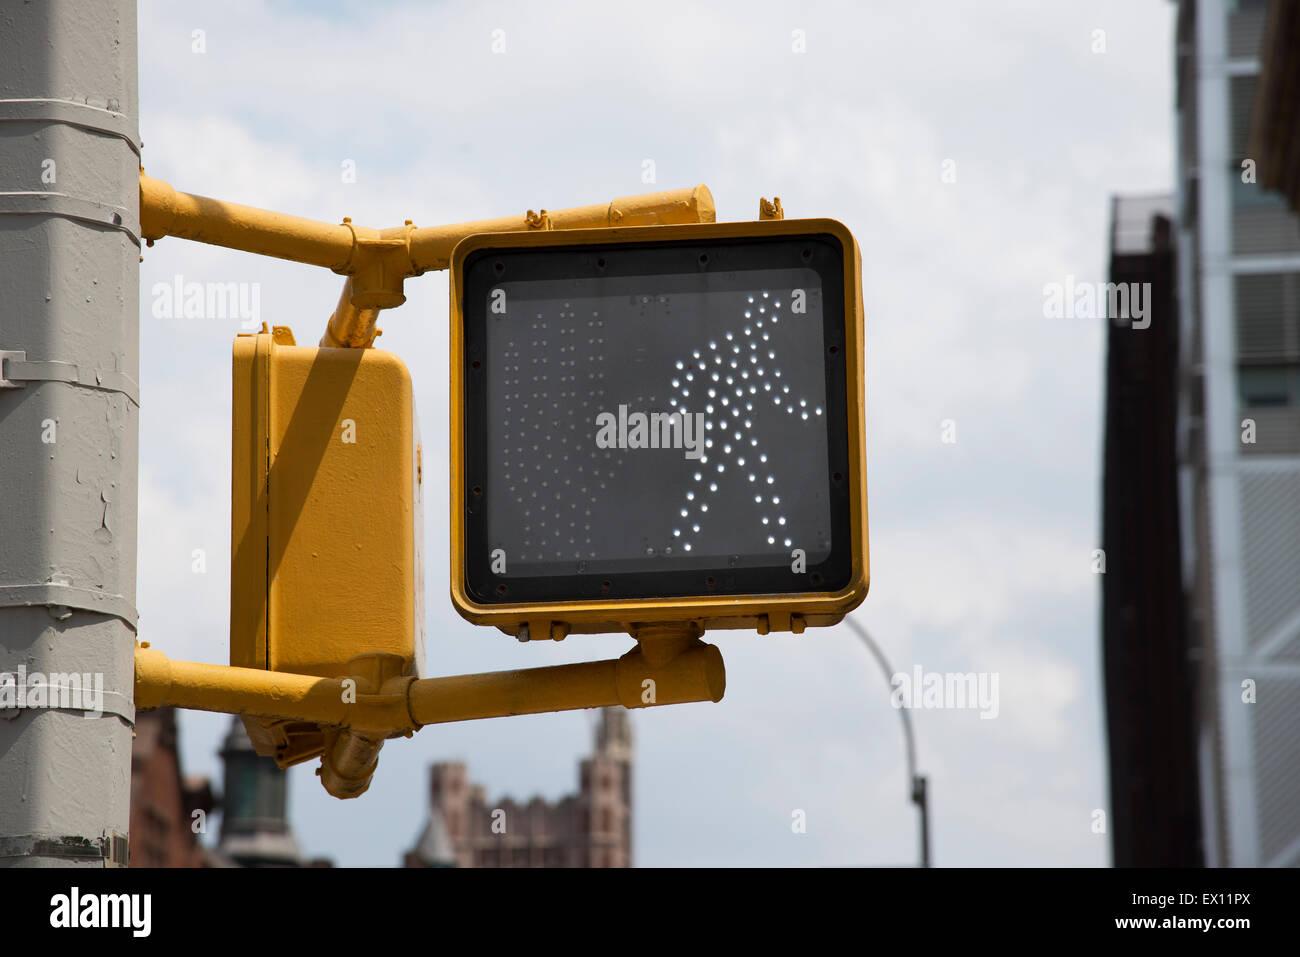 Pedestrian crossing 'walking man' sign in New York USA - Stock Image